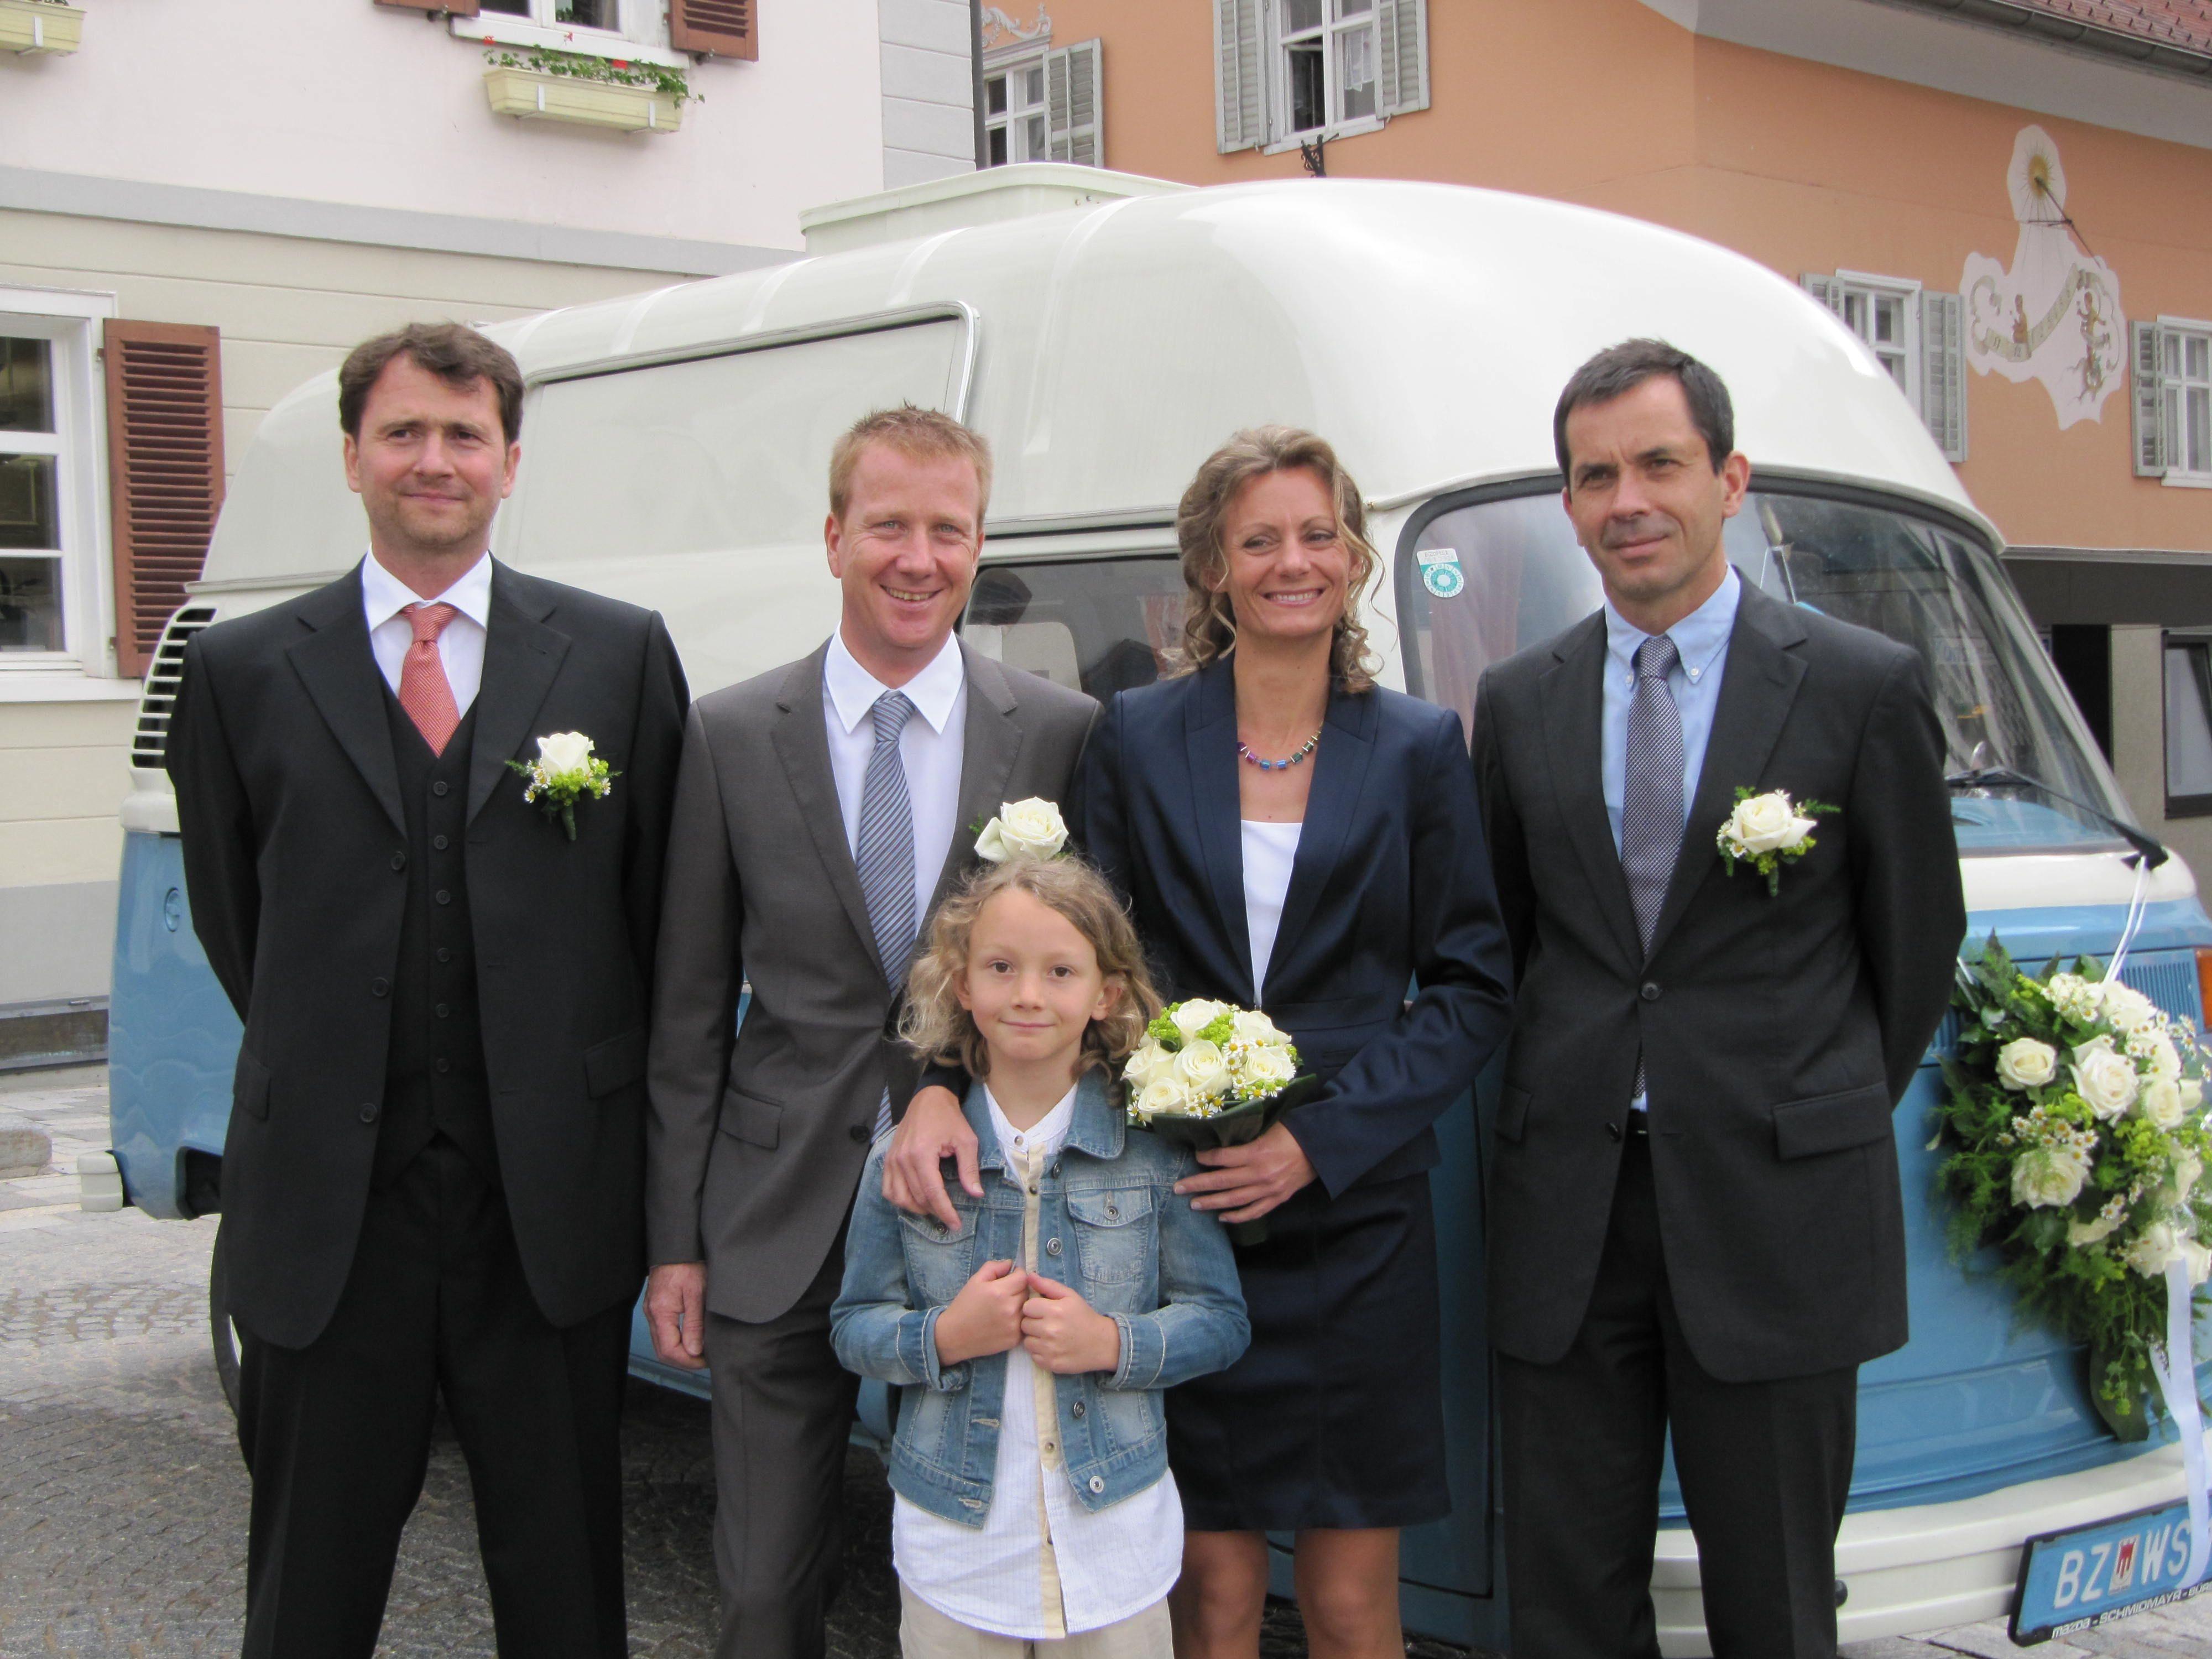 Partnersuche bezirk rankweil: Seebach singles kennenlernen